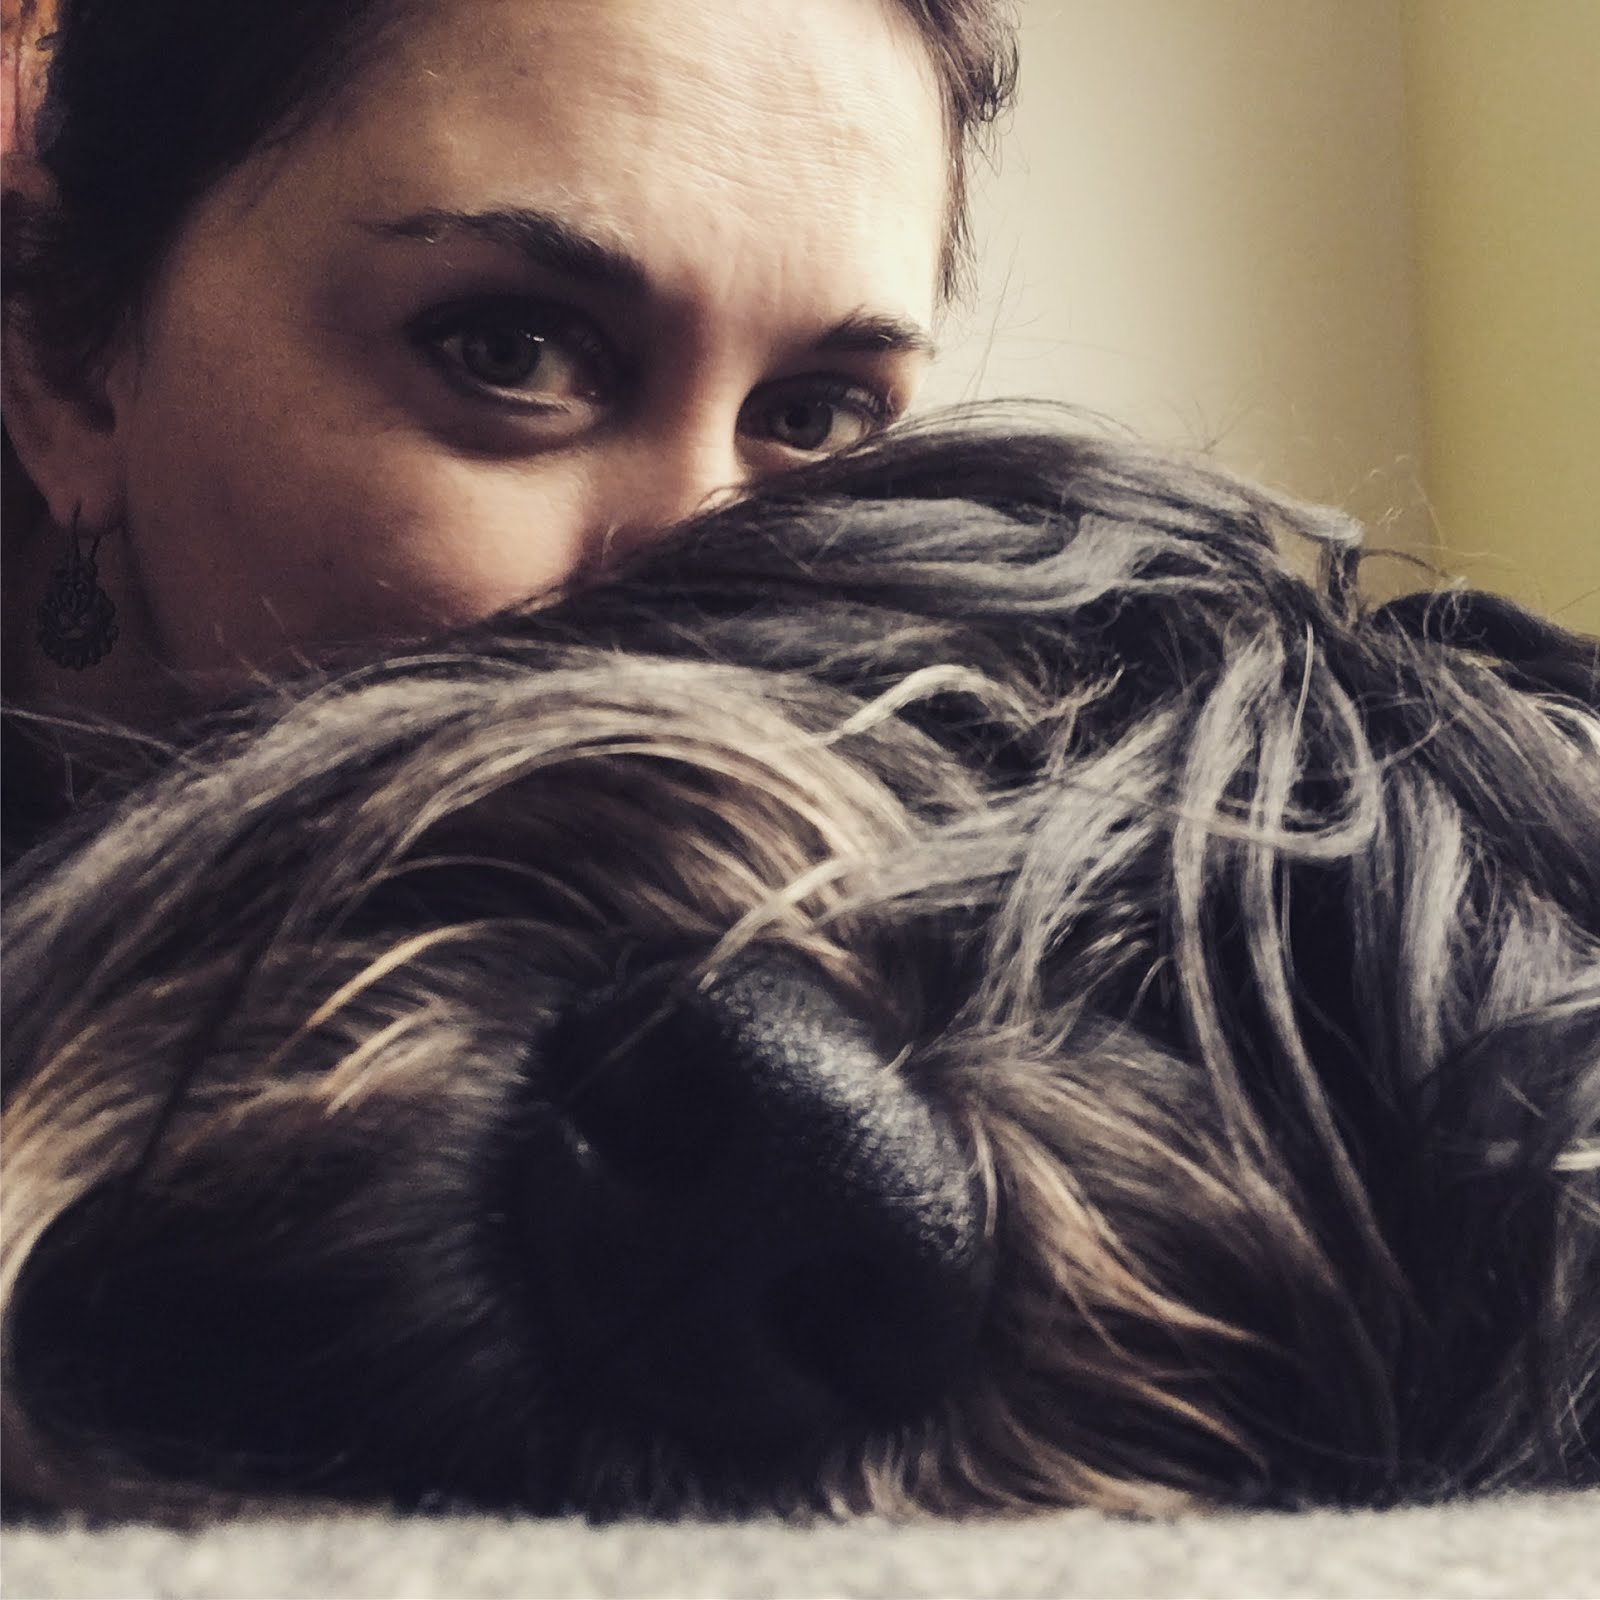 Lola & ik